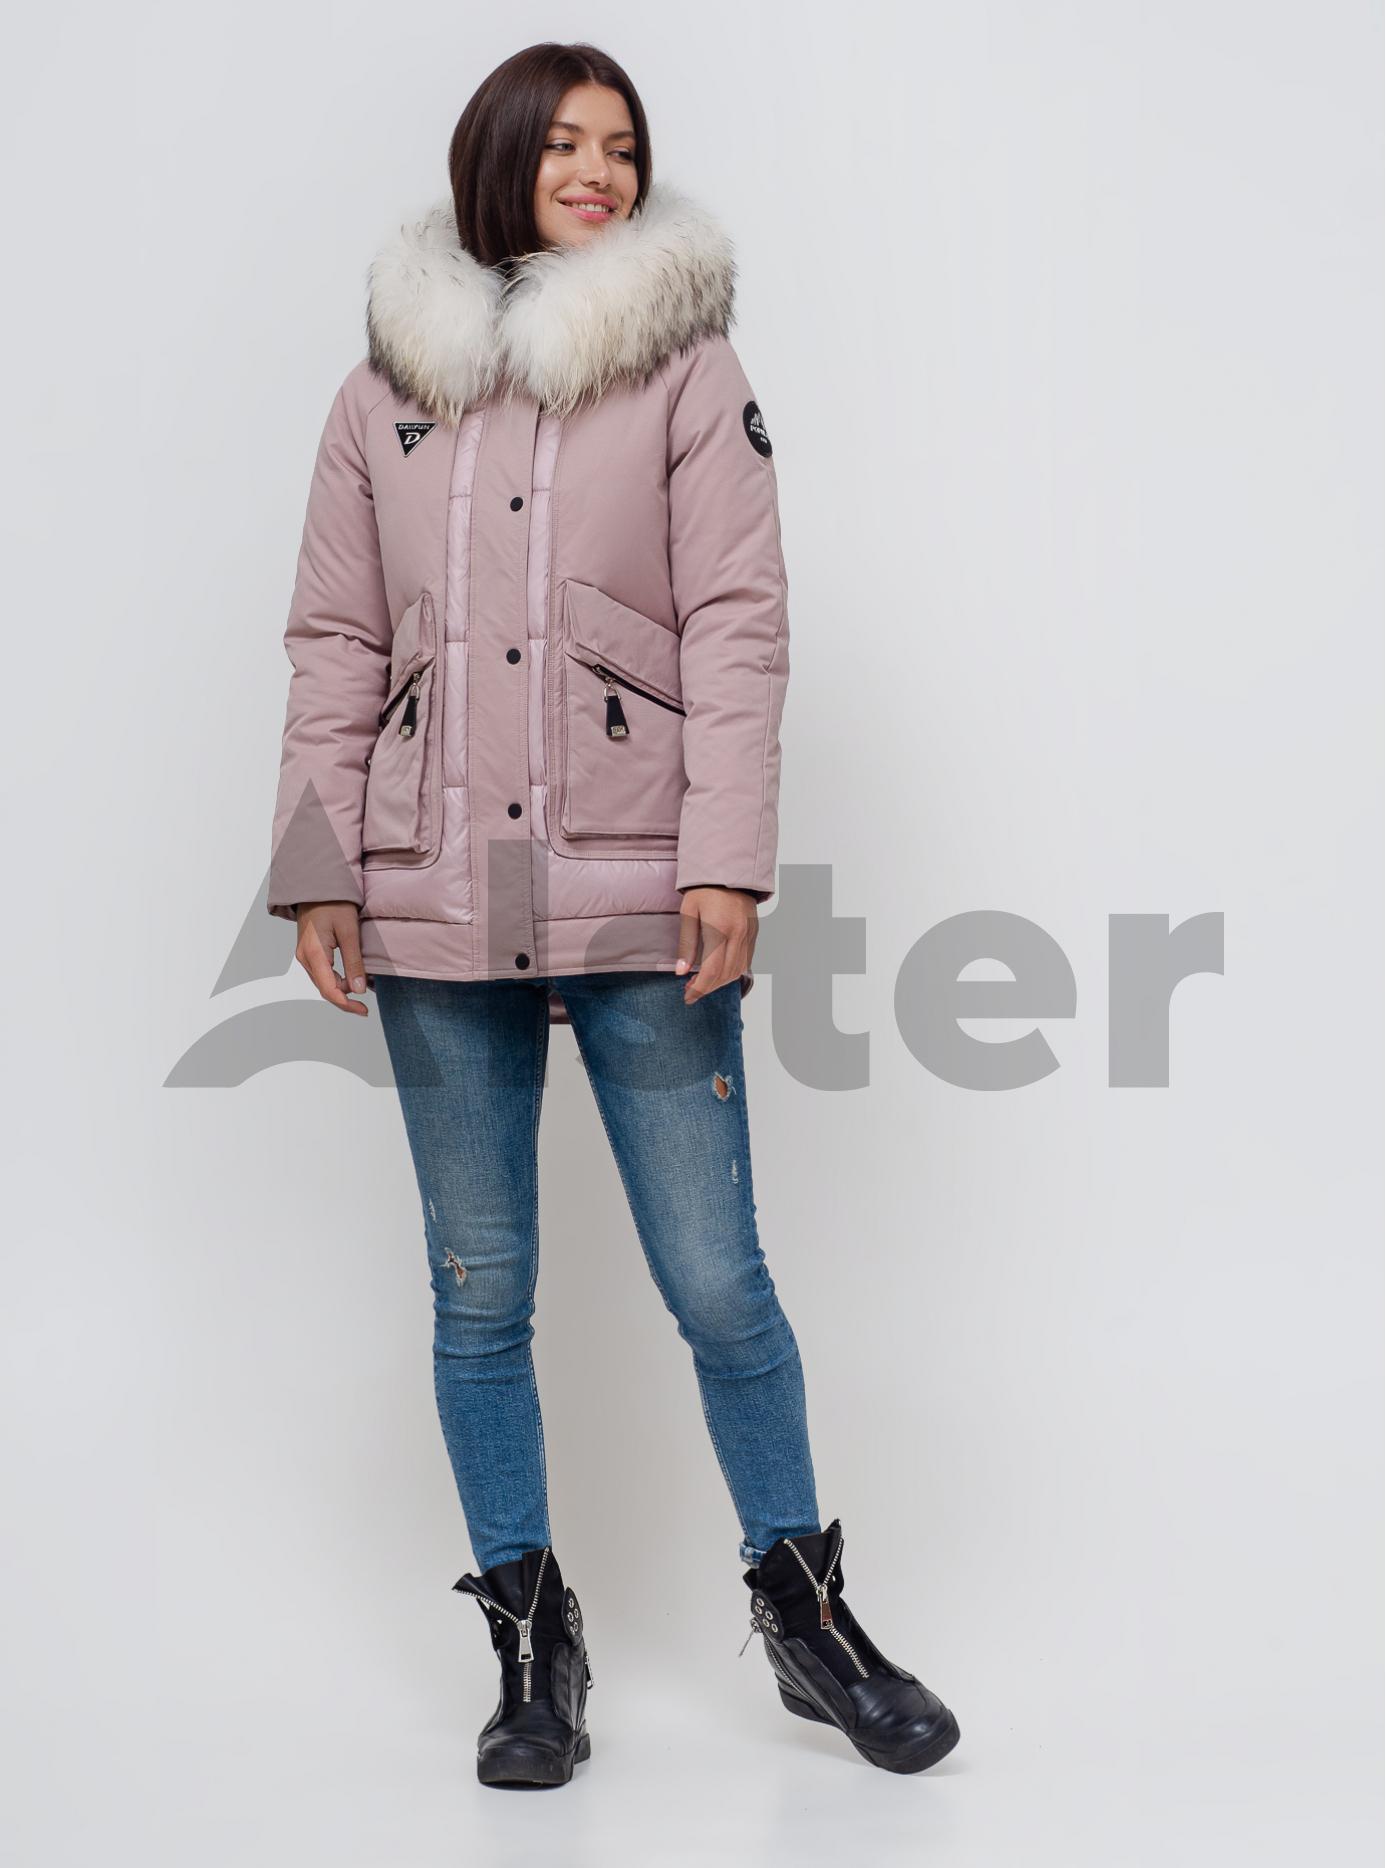 Пуховик зимний с мехом енота Красный S (02-N200405): фото - Alster.ua